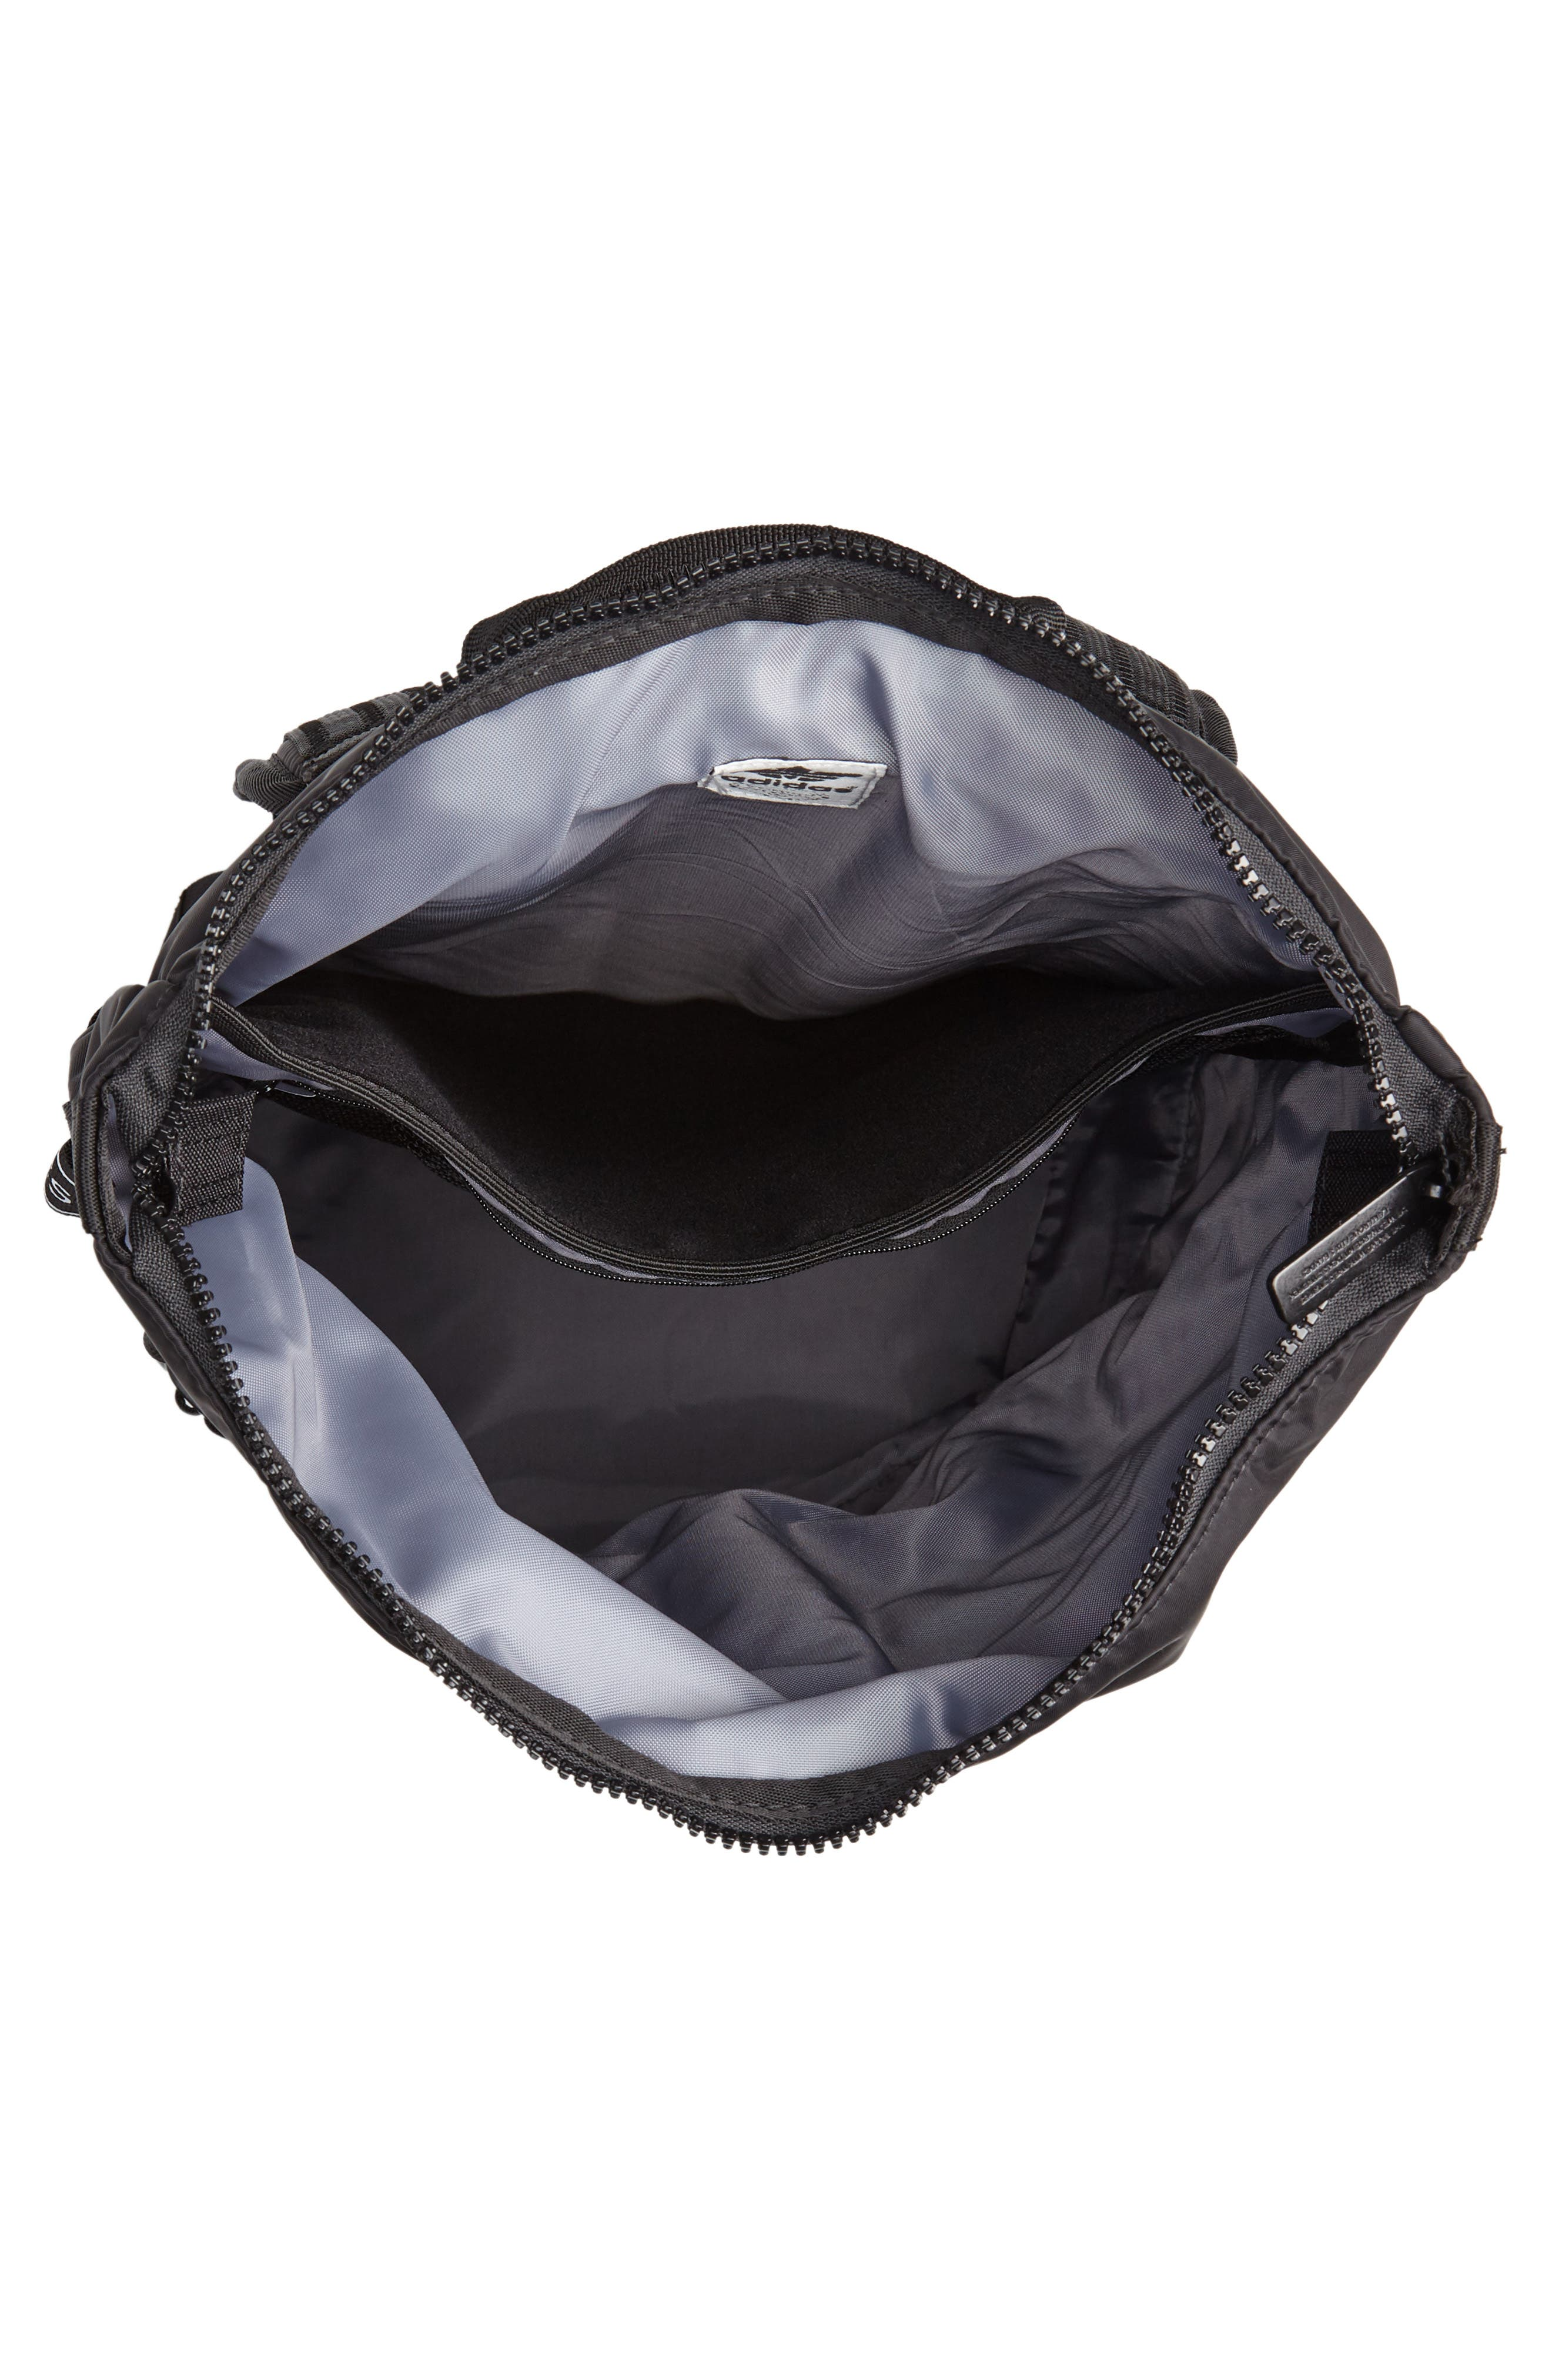 adidas NMD Backpack,                             Alternate thumbnail 4, color,                             BLACK